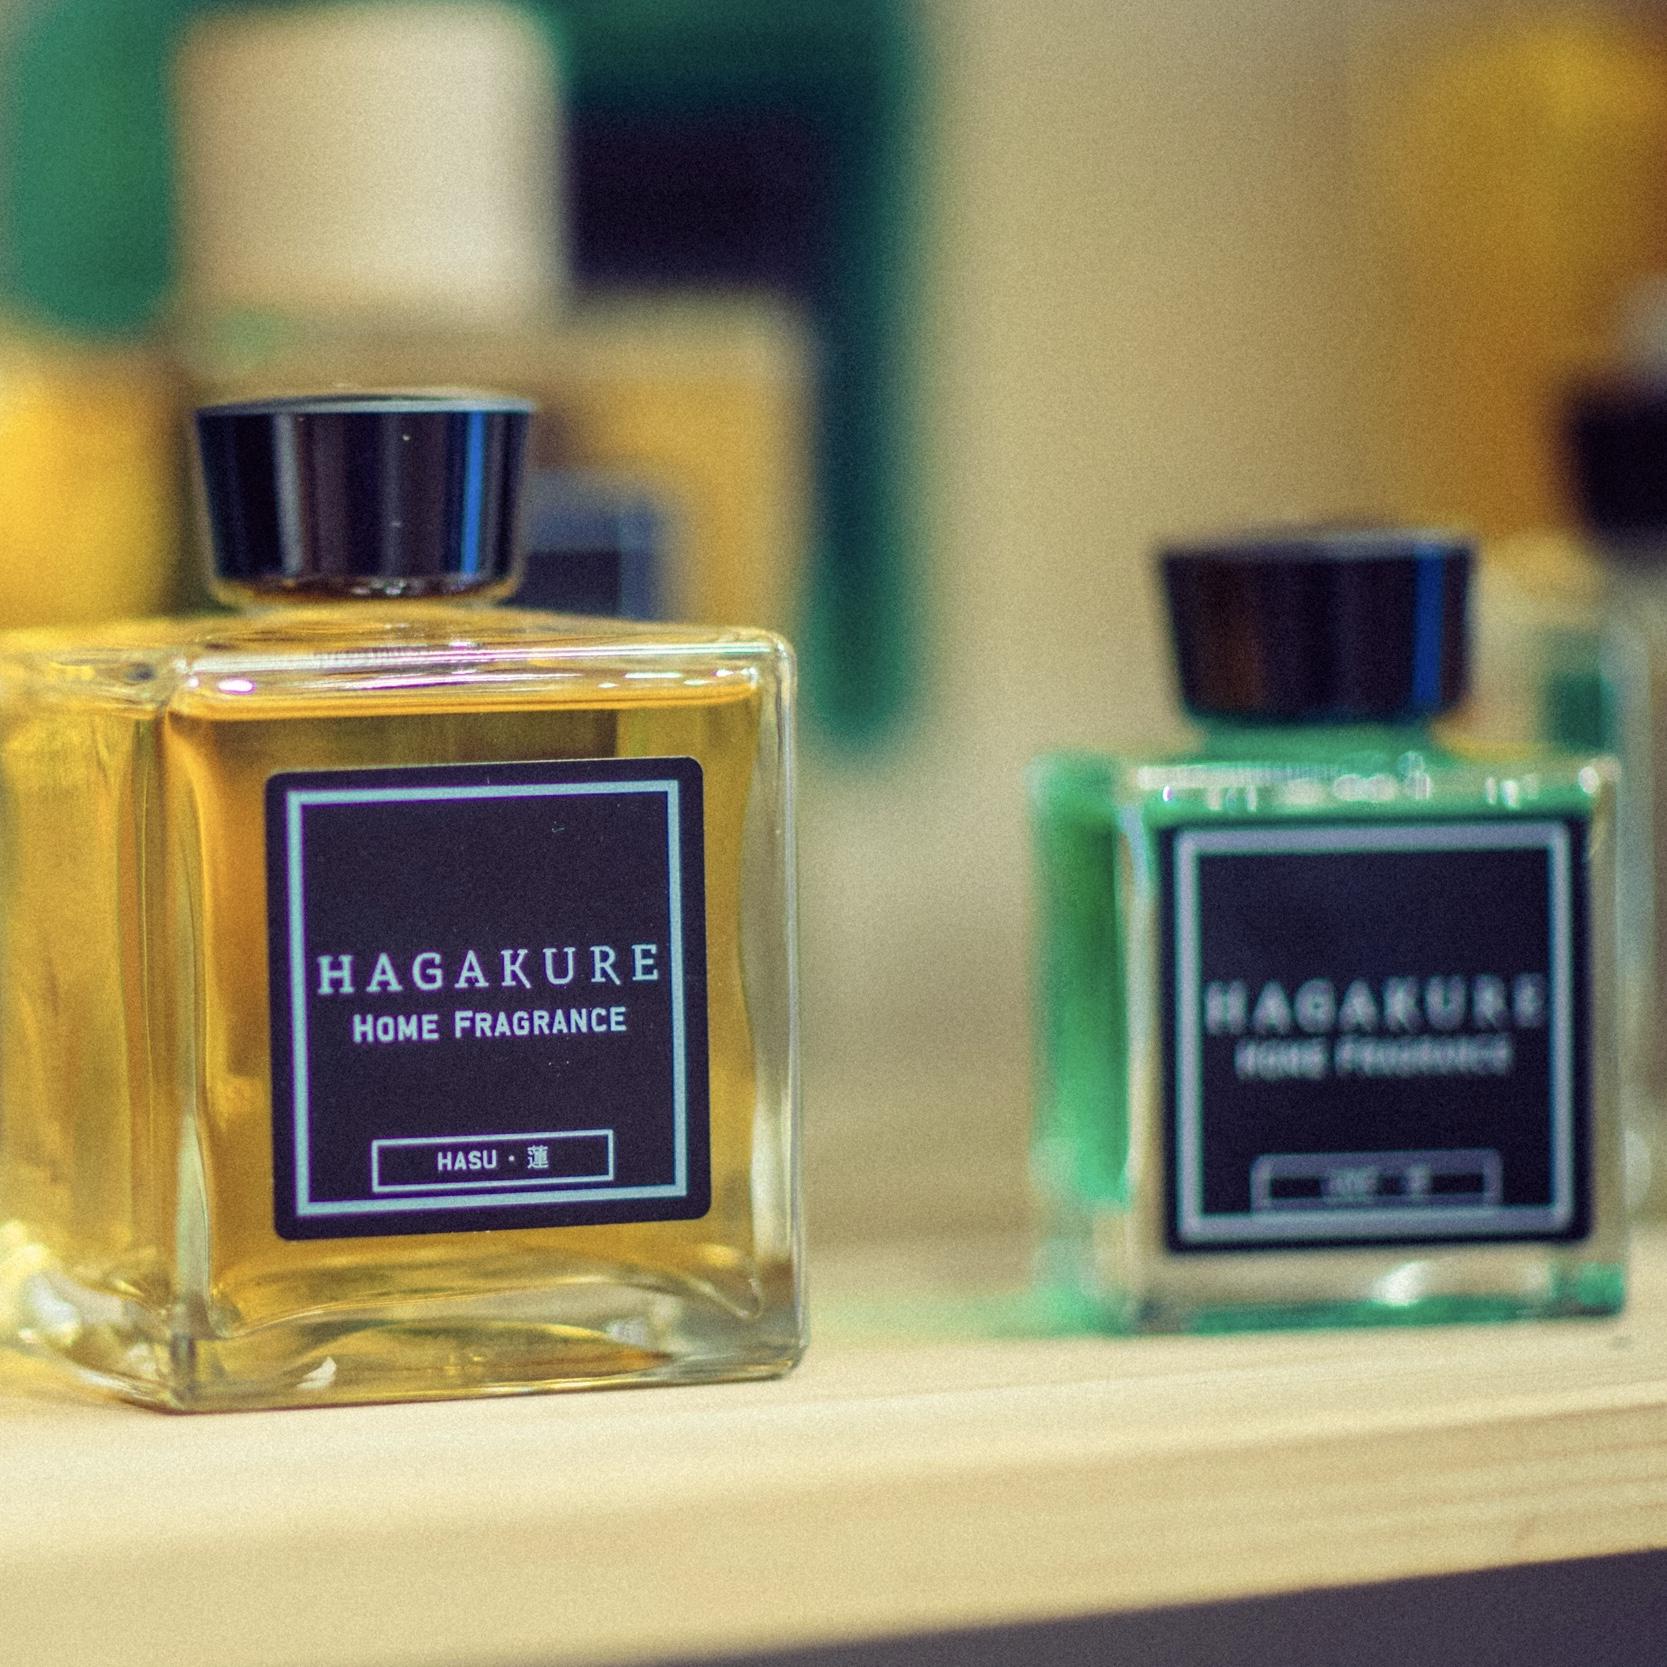 hagakure sushi fusion Hagakure Home Fragrance